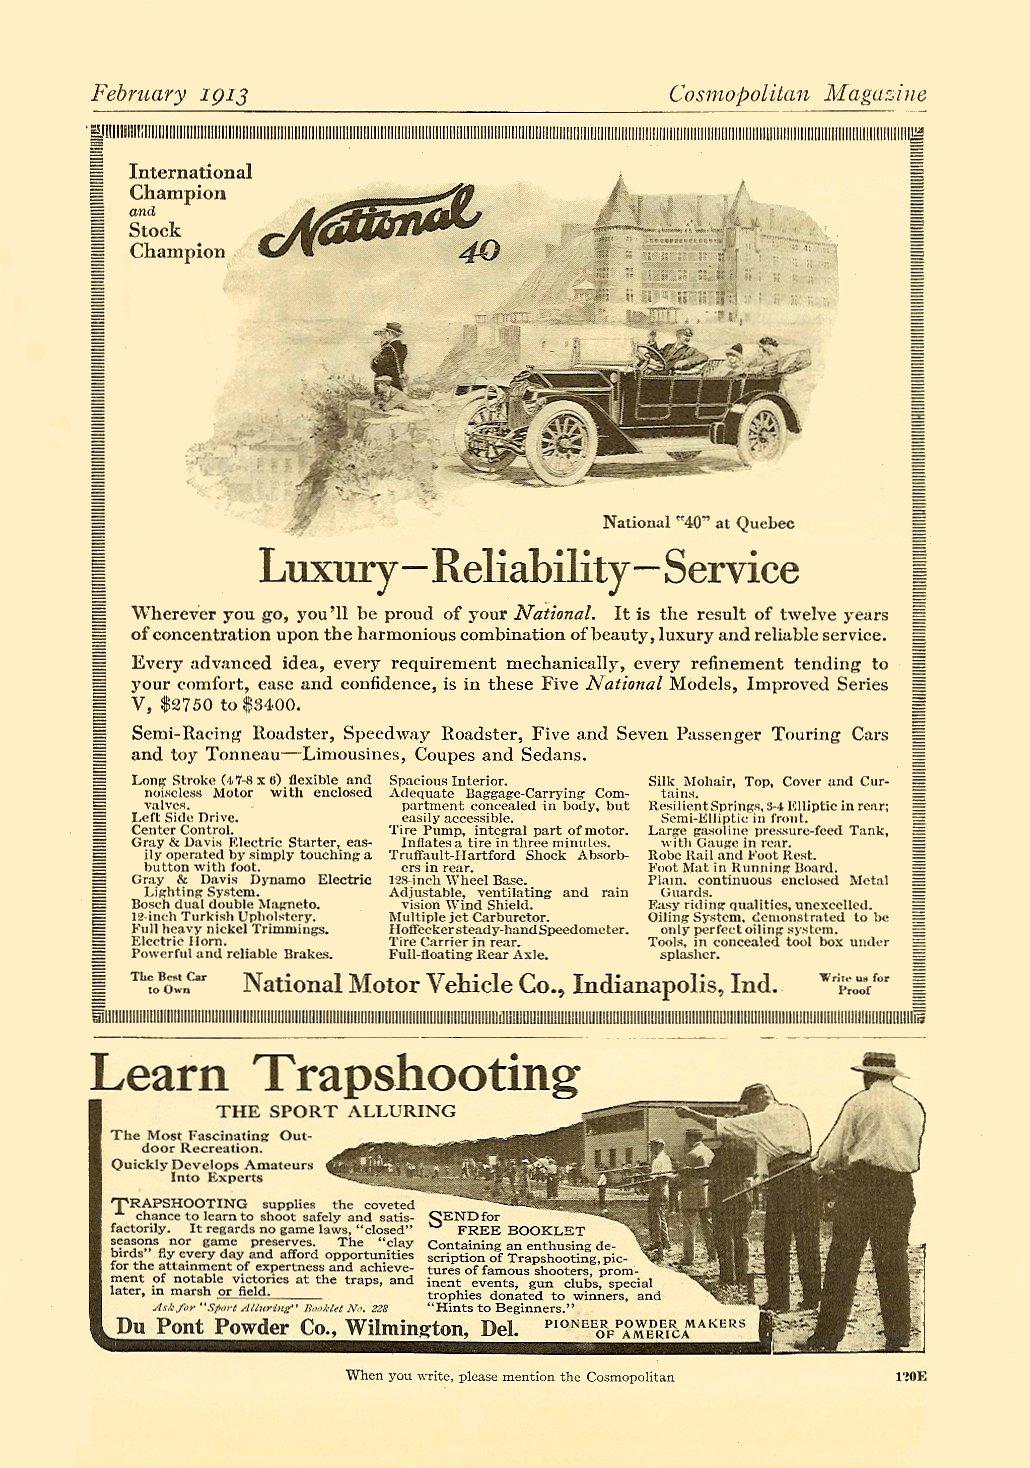 1913 2 NATIONAL National 40 Luxury-Reliability-Service February 1913 Cosmopolitan Magazine 6.75″x9.75″ page 120E